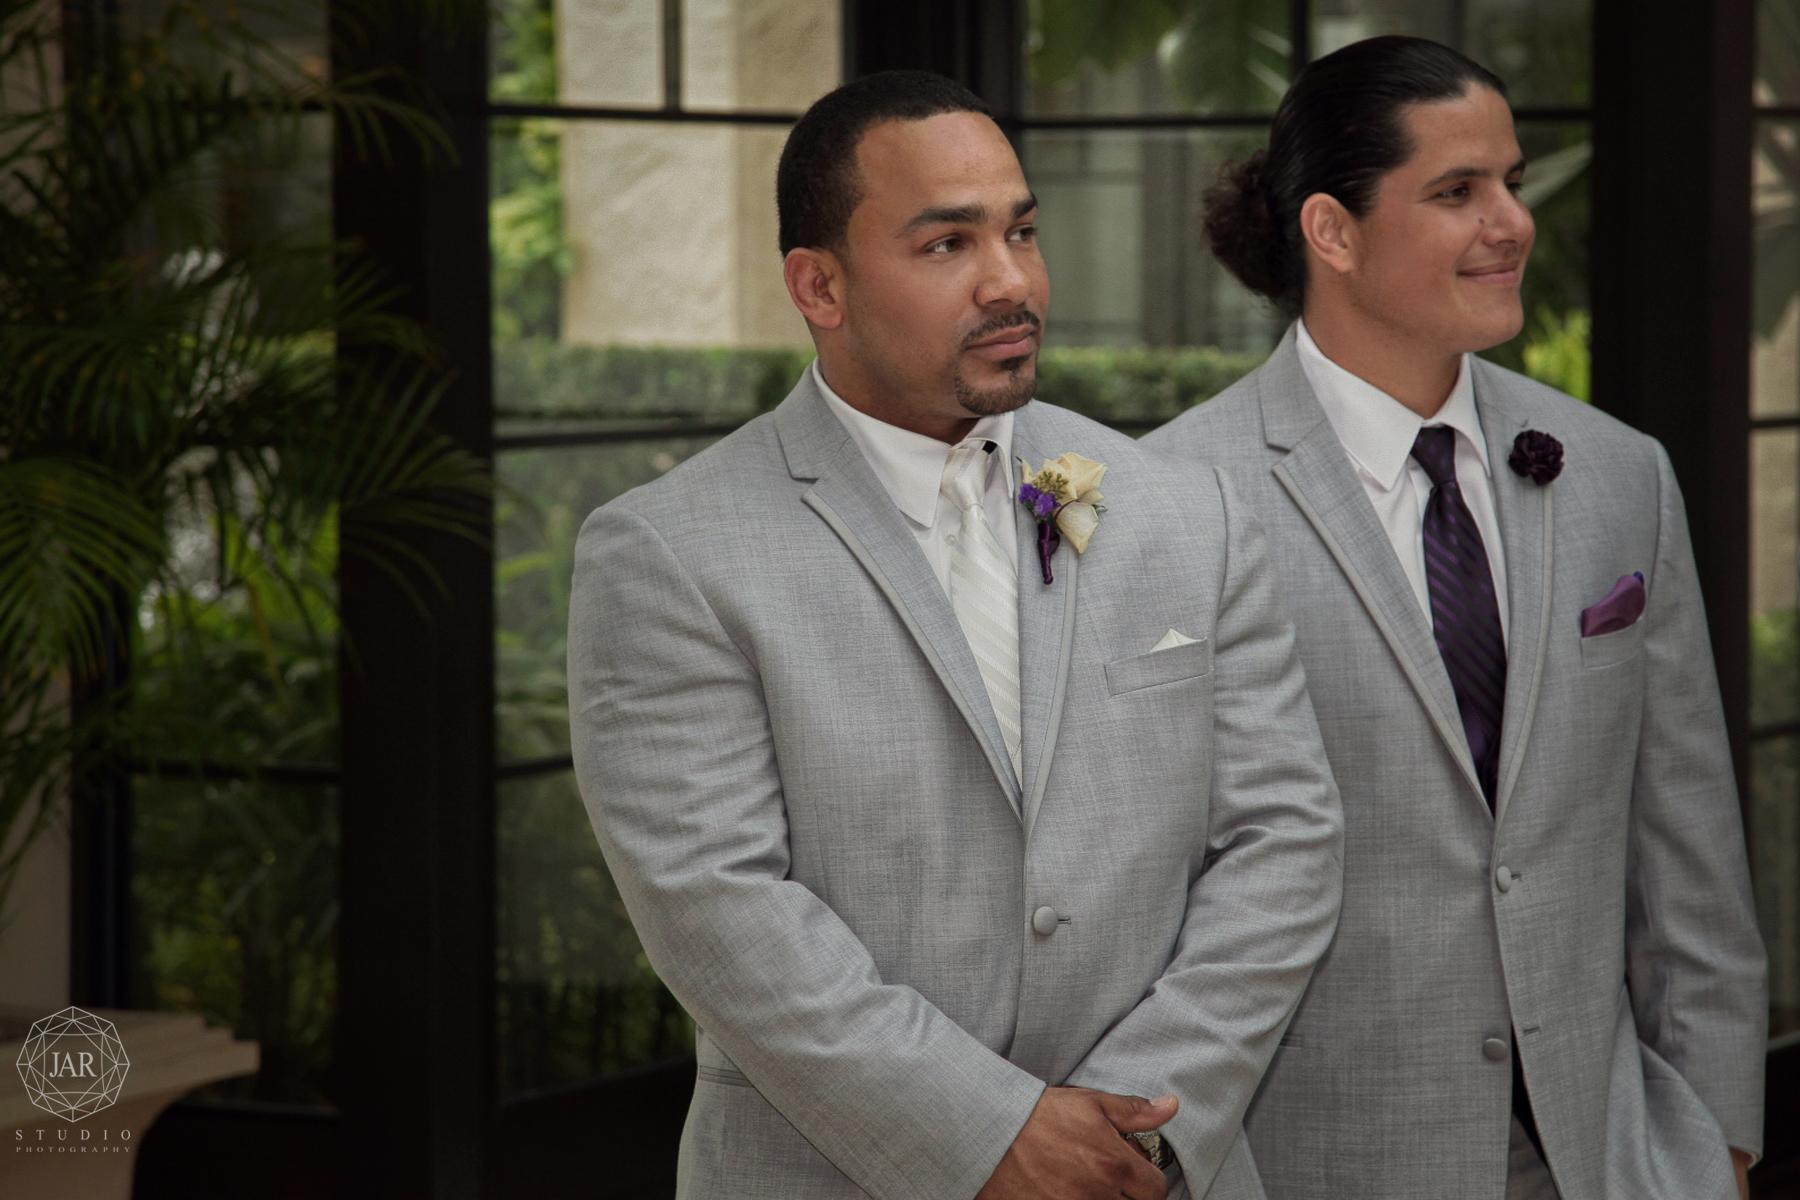 13-groom-ceremony-orlando-venues-jarstudio.JPG